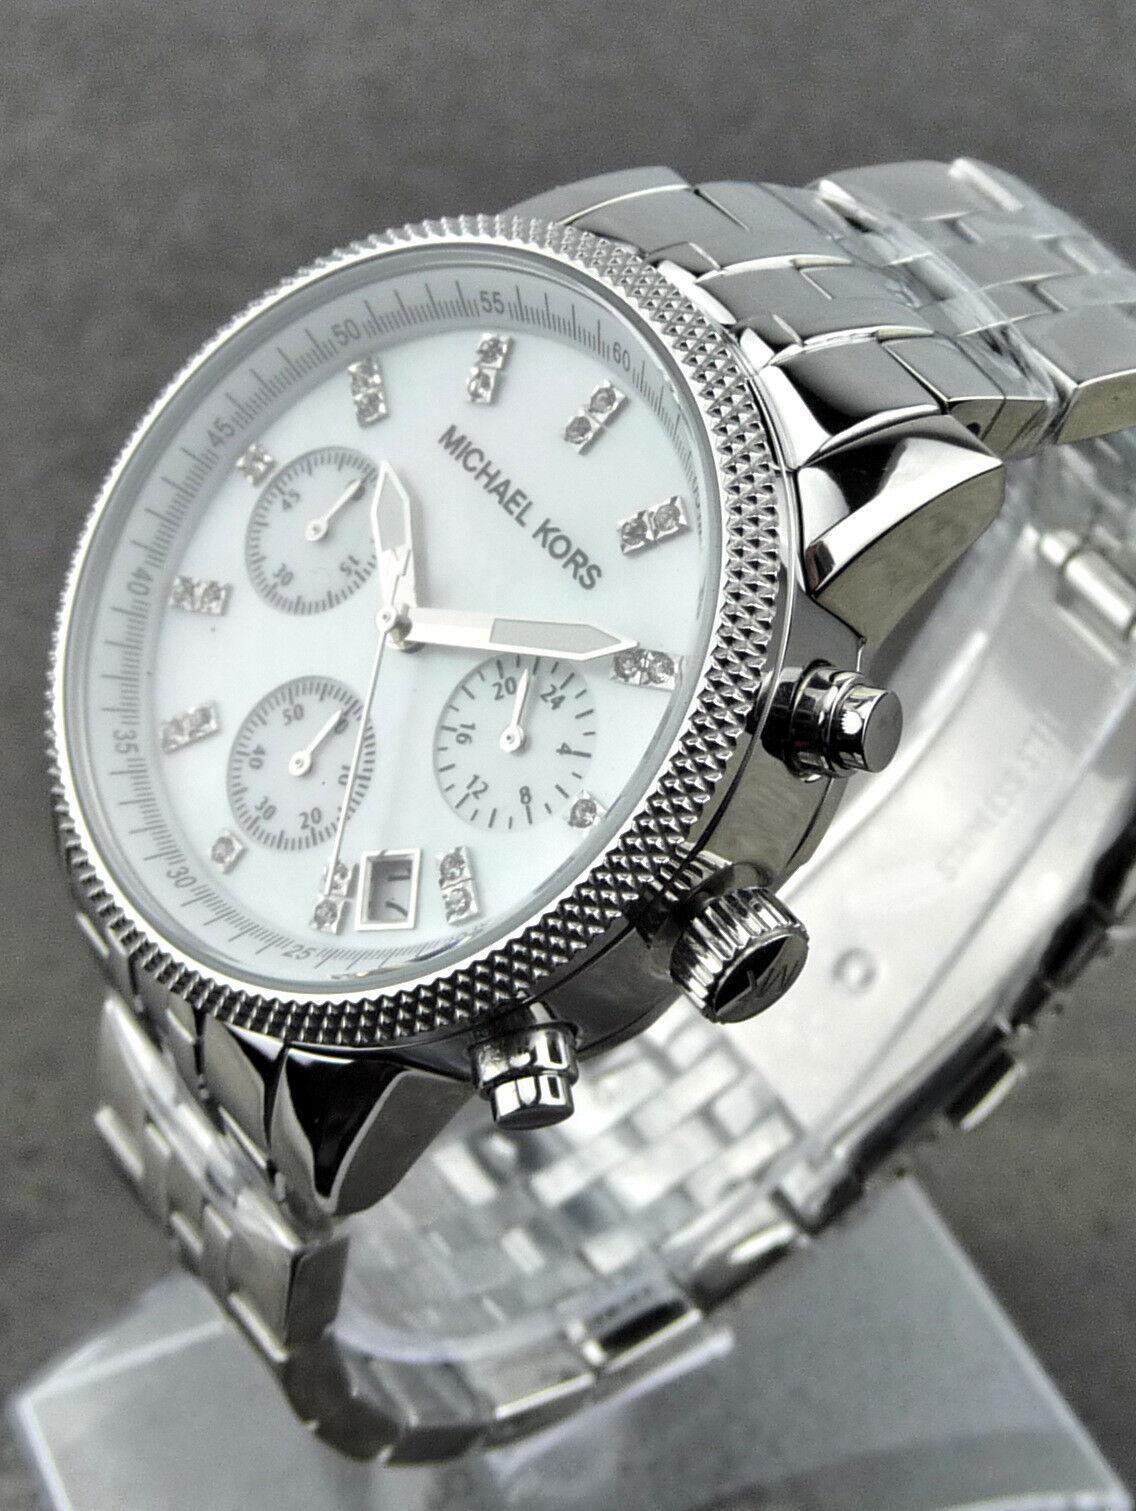 Michael Kors MK5020 Armbanduhr für Damen SILBERFARBEN/PERLMUTTFARBEN NEU